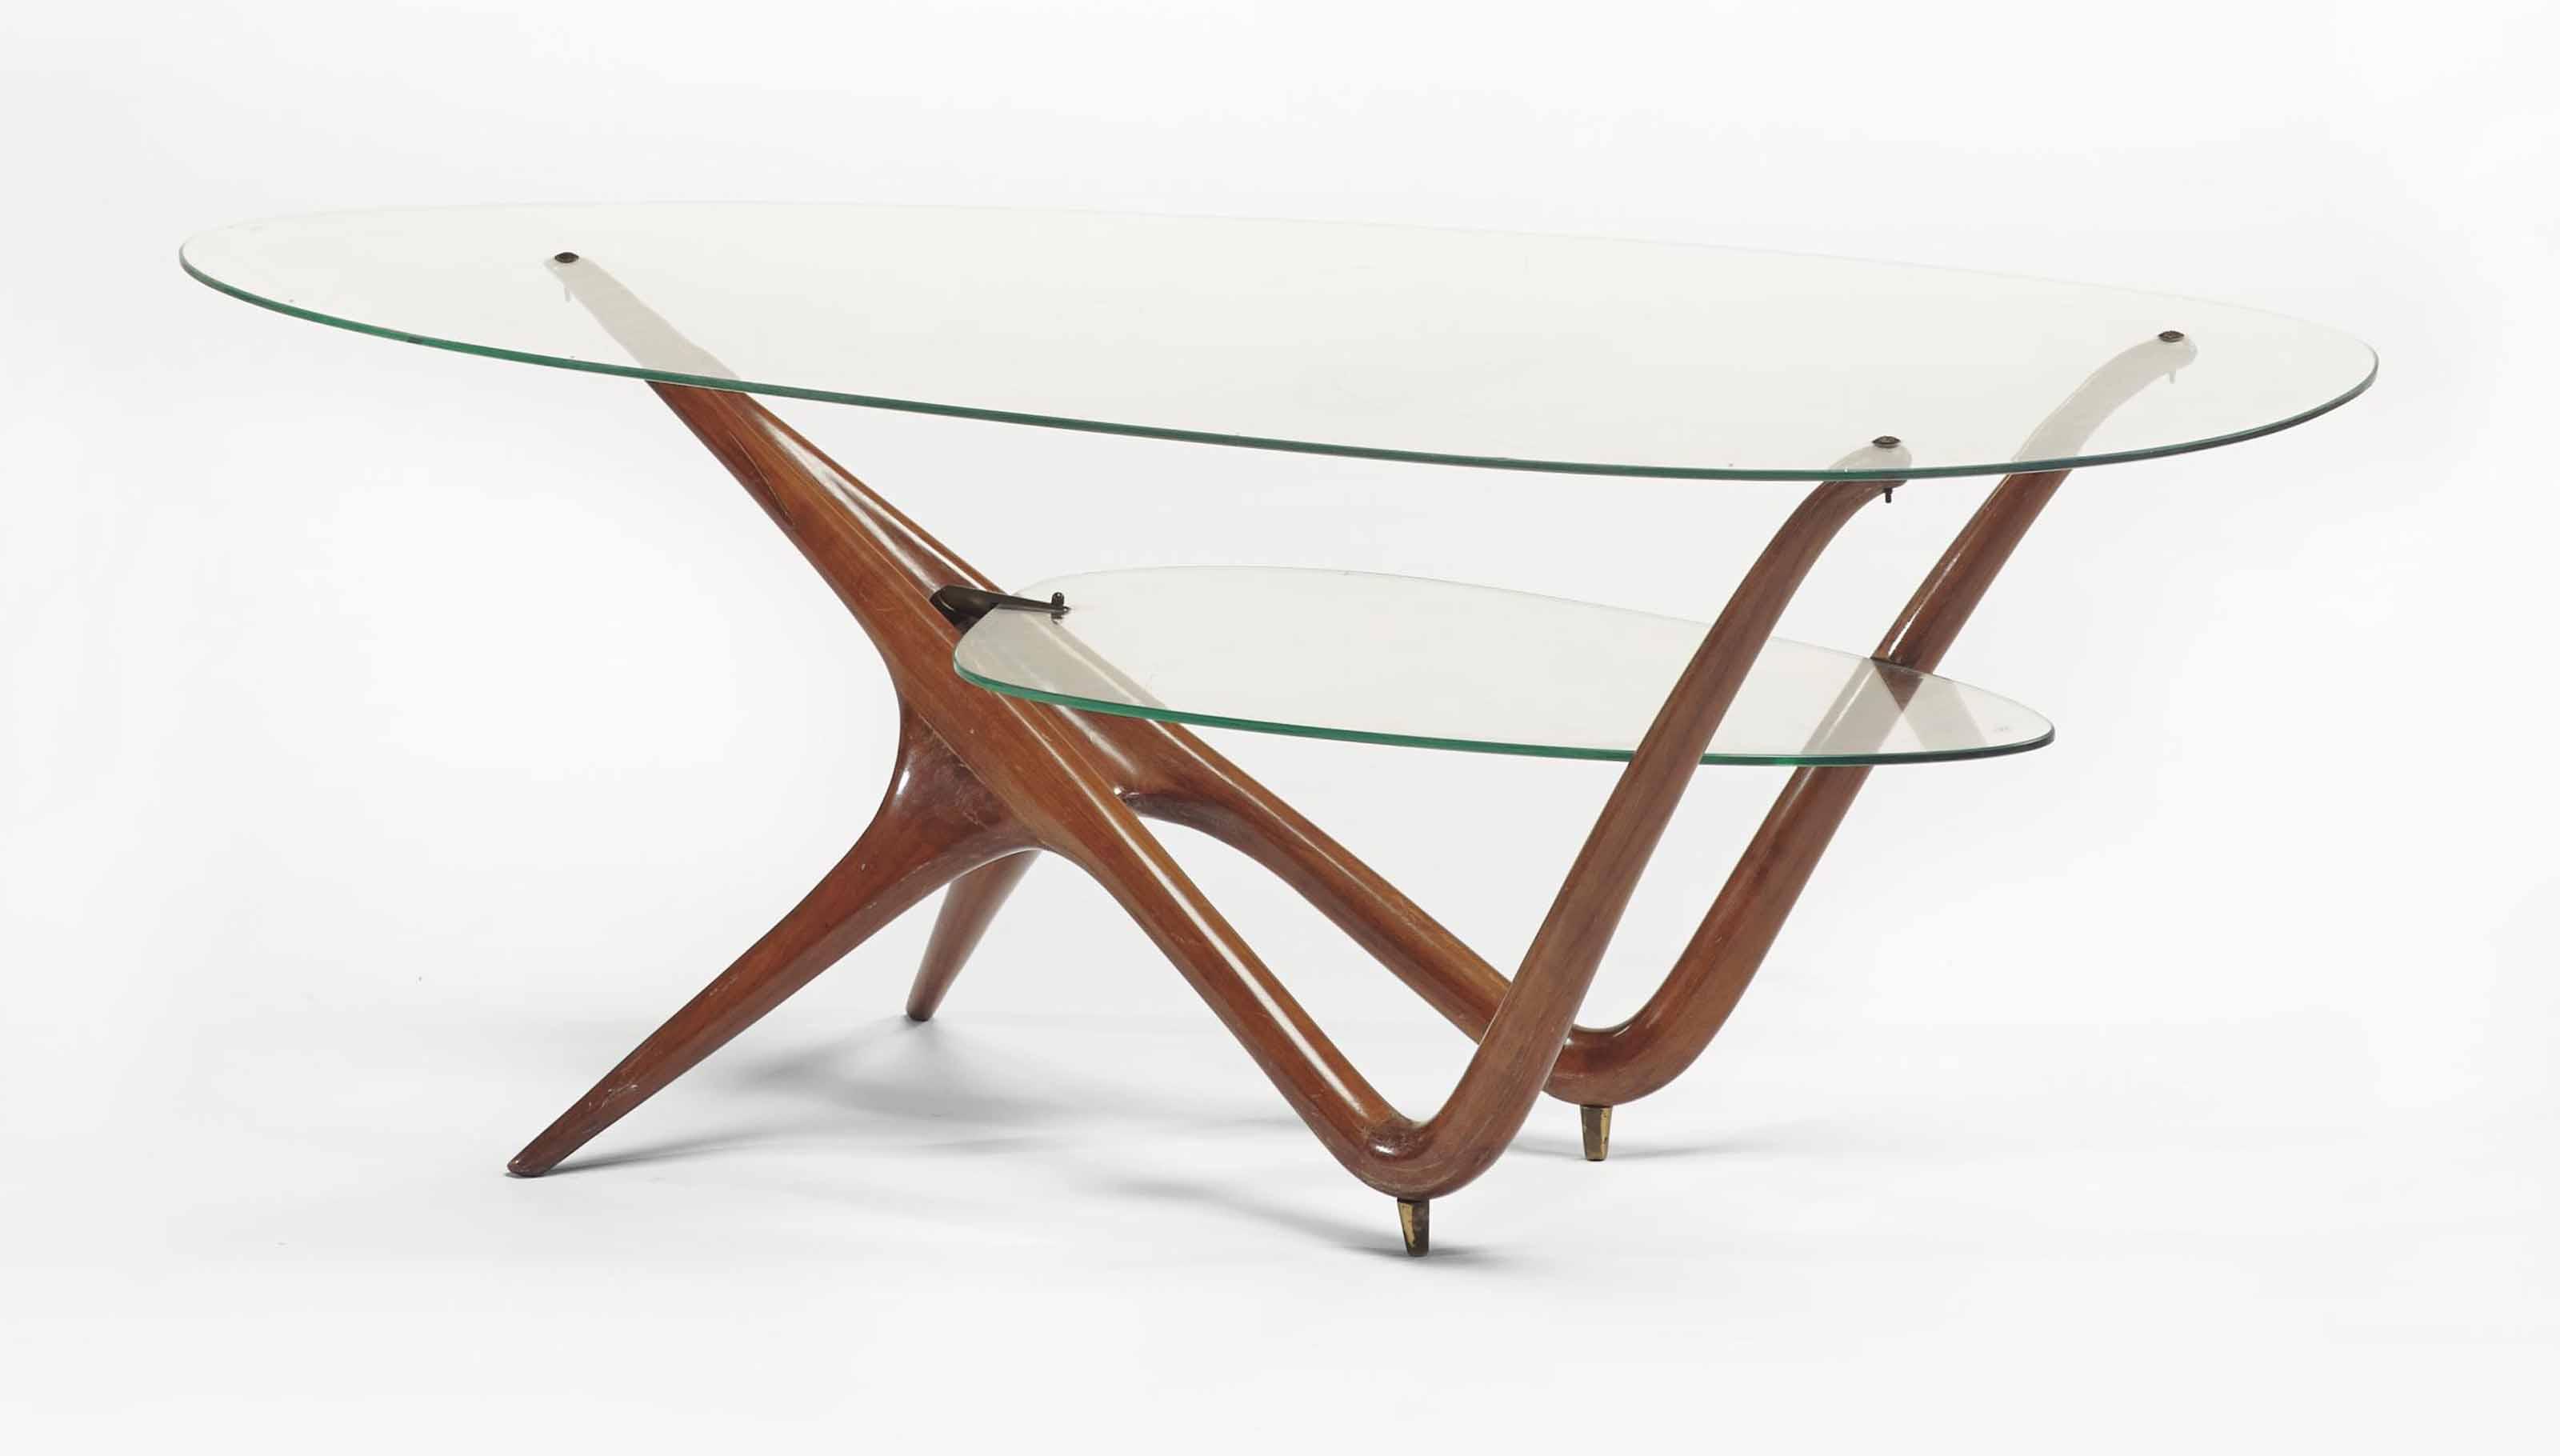 Amazing Carlo Mollino 1905 1973 Table Basse Realisee Par Apelli Inzonedesignstudio Interior Chair Design Inzonedesignstudiocom